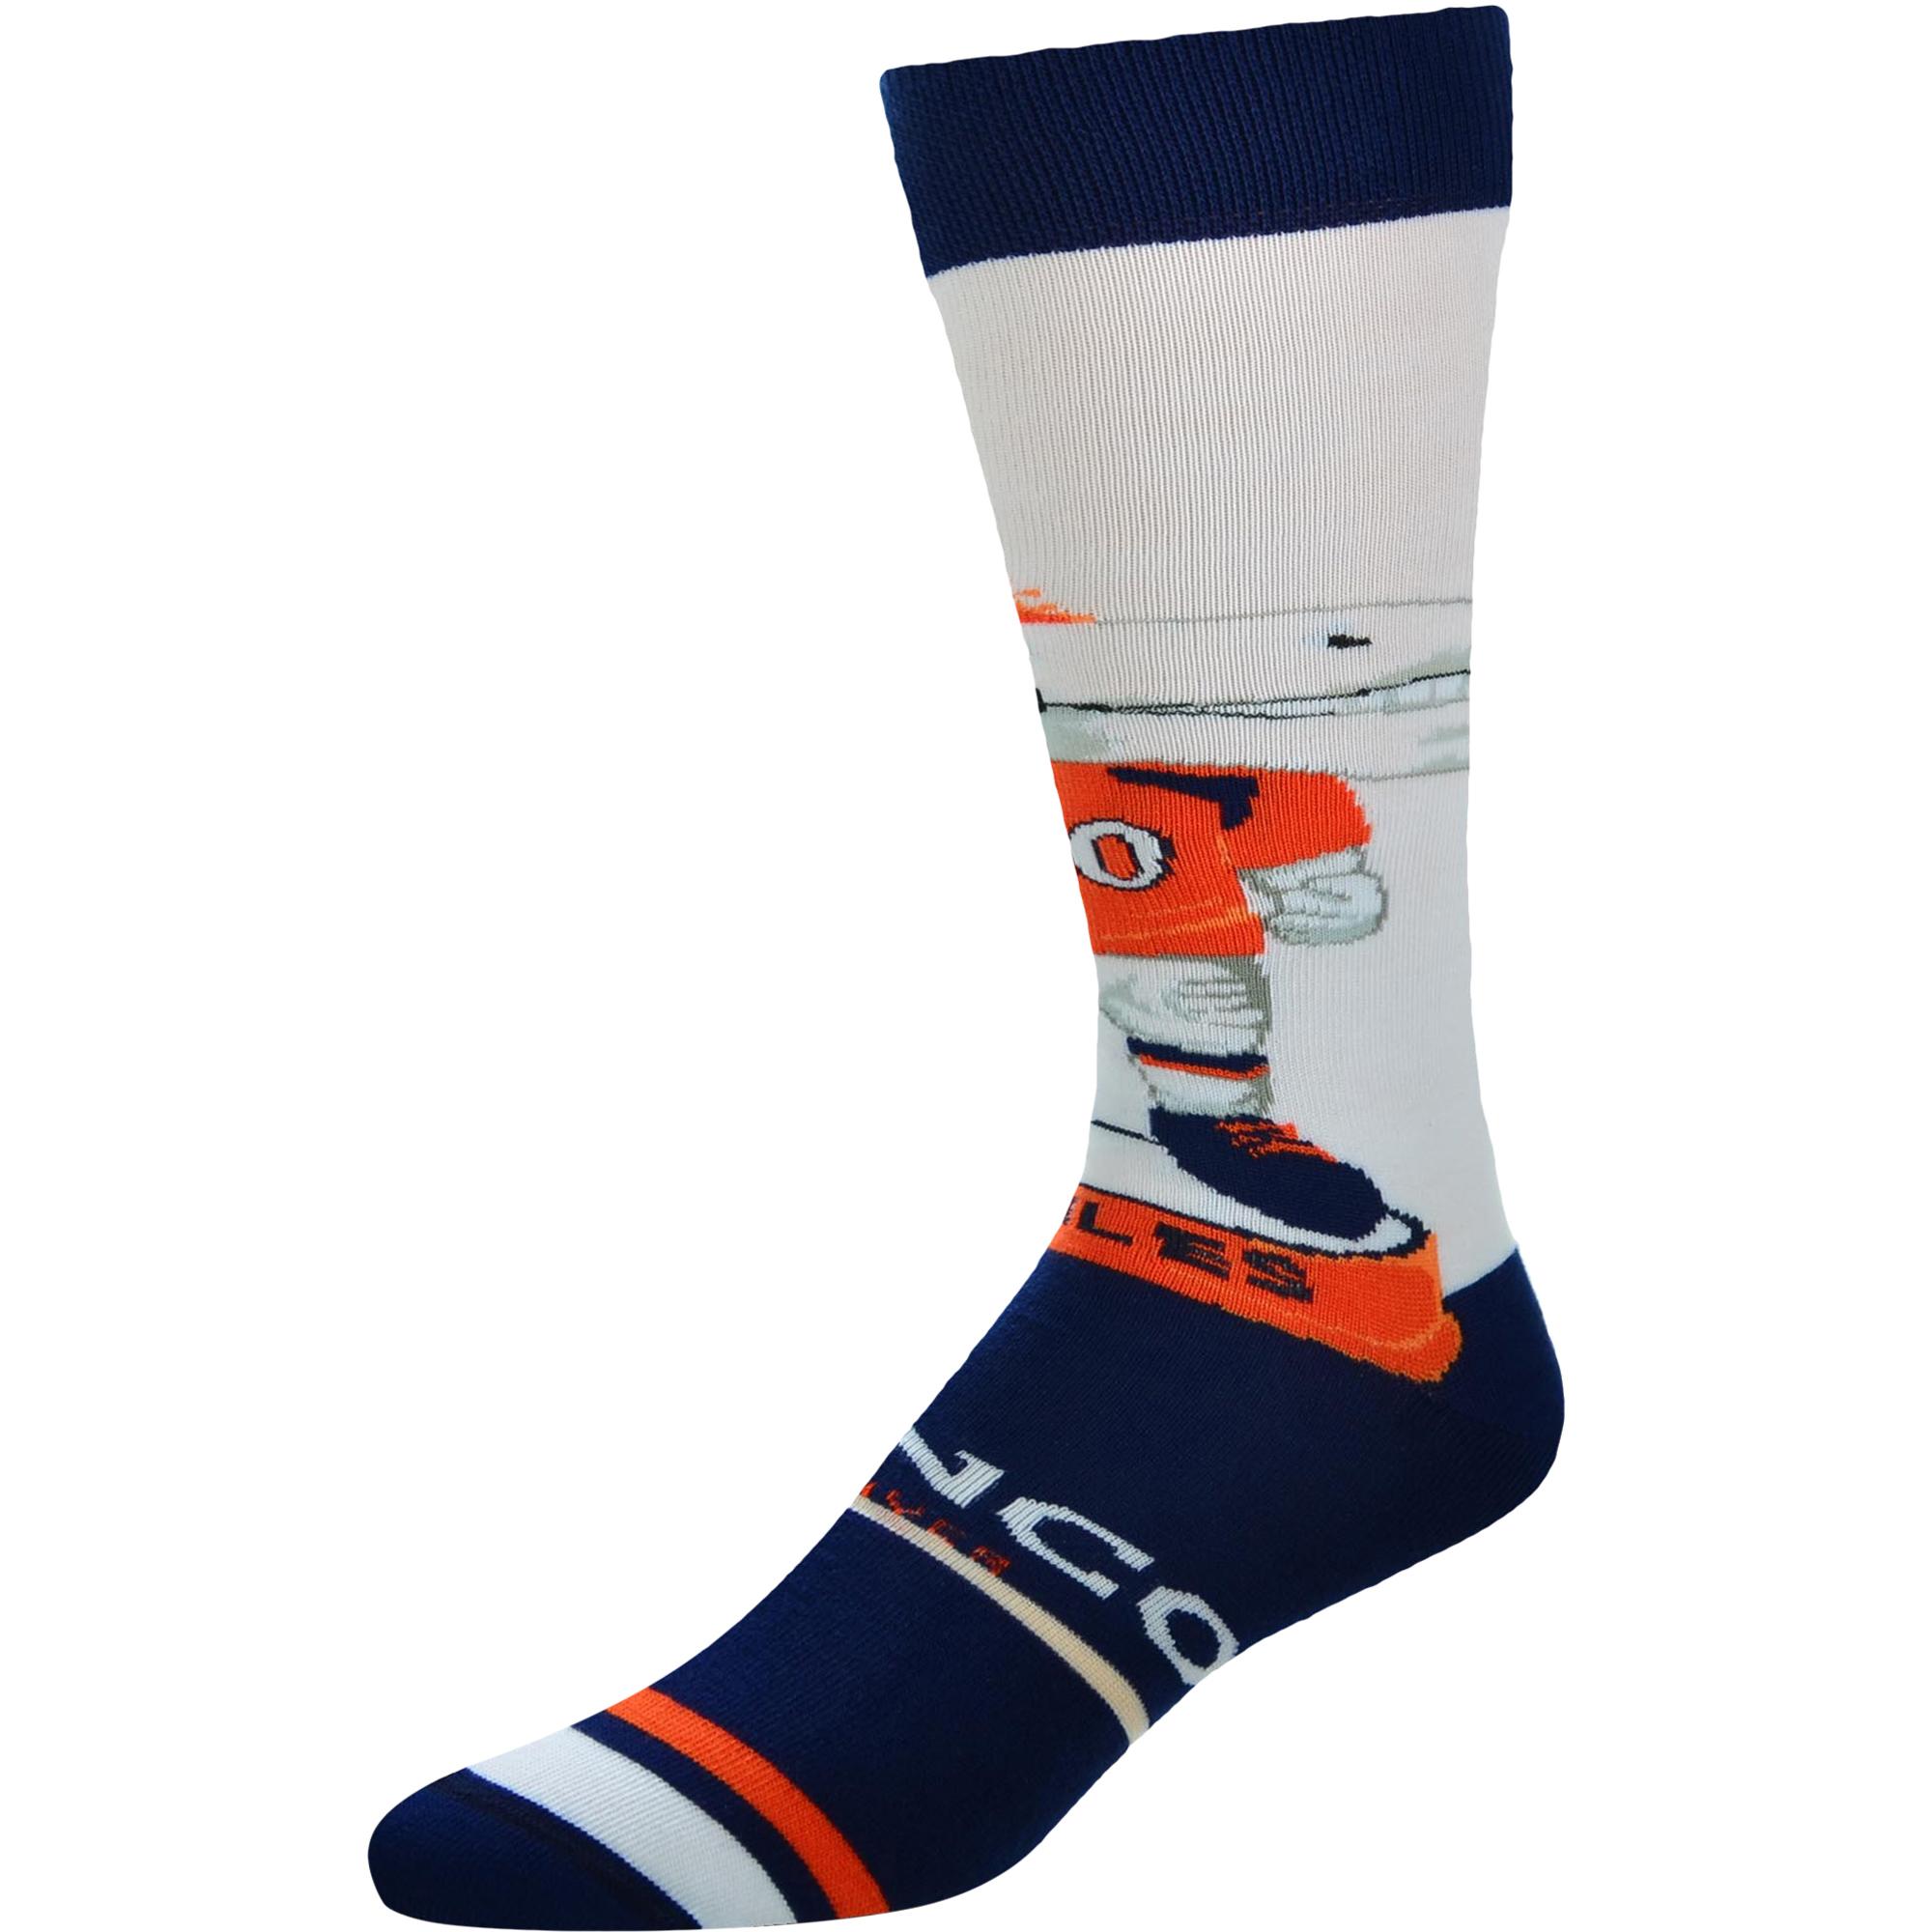 Denver Broncos For Bare Feet Youth Mascot Bobble Head Quarter-Length Socks - No Size